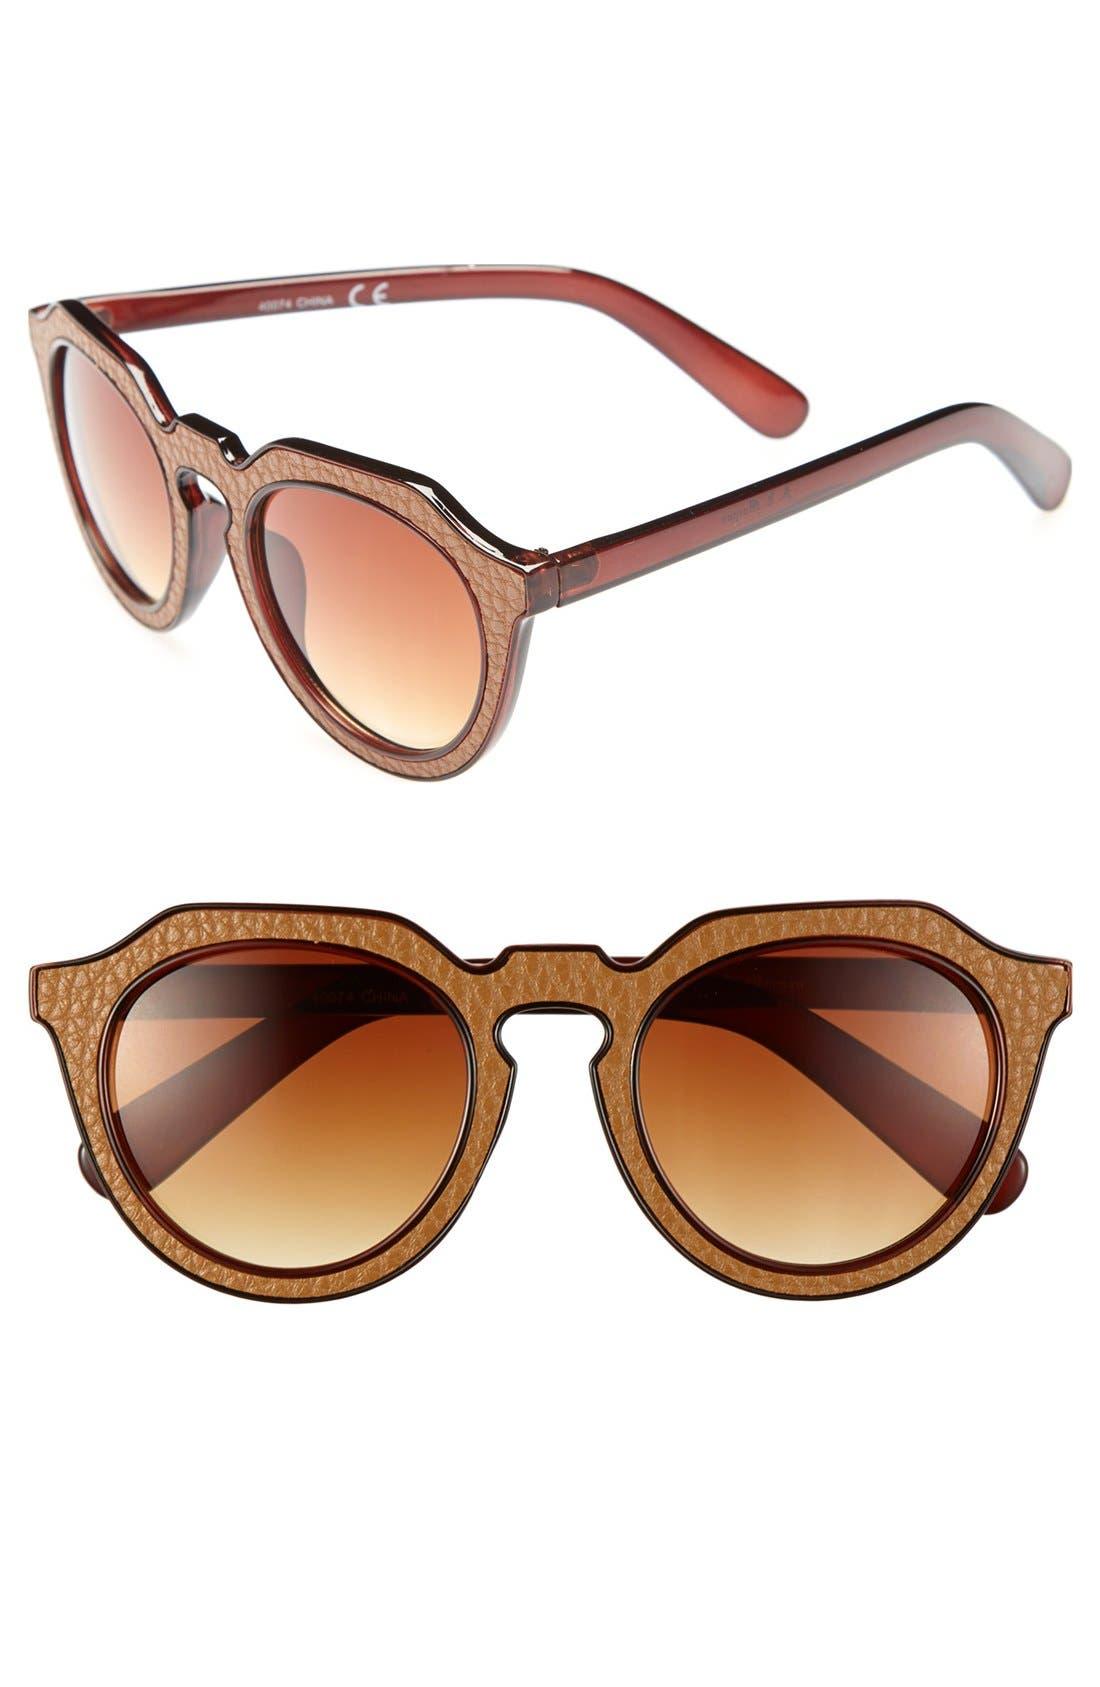 Main Image - A.J. Morgan 'Zipster' 50mm Sunglasses